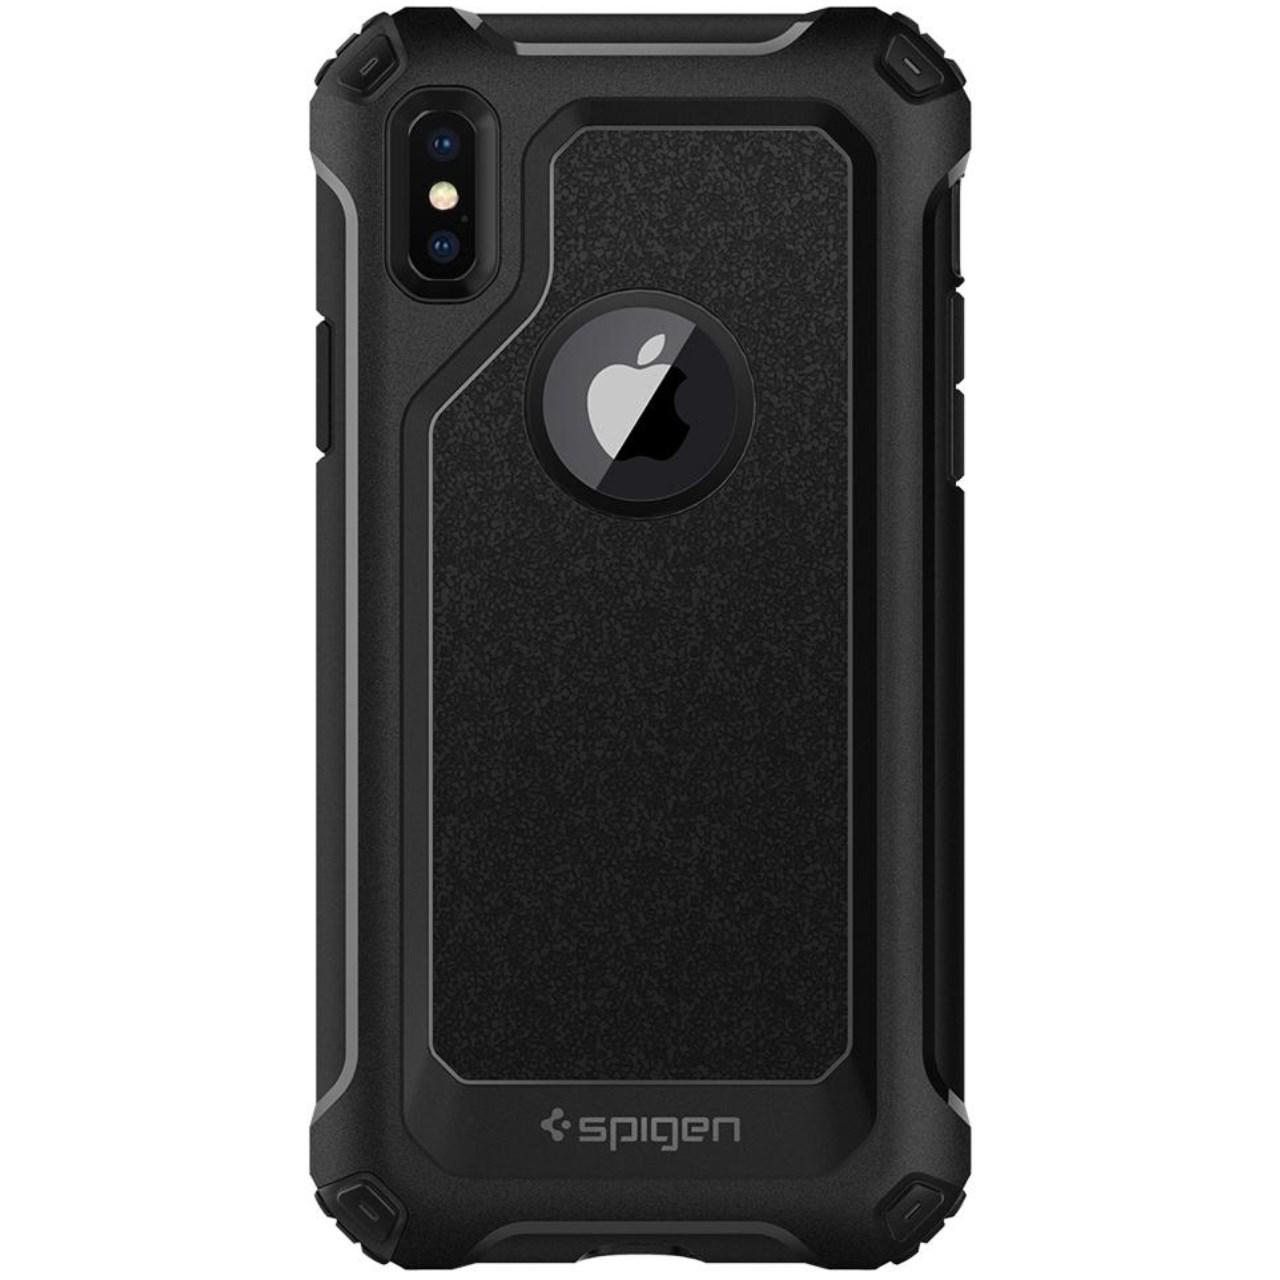 کاور اسپیگن مدل Pro Guard مناسب برای گوشی موبایل اپل iPhone X